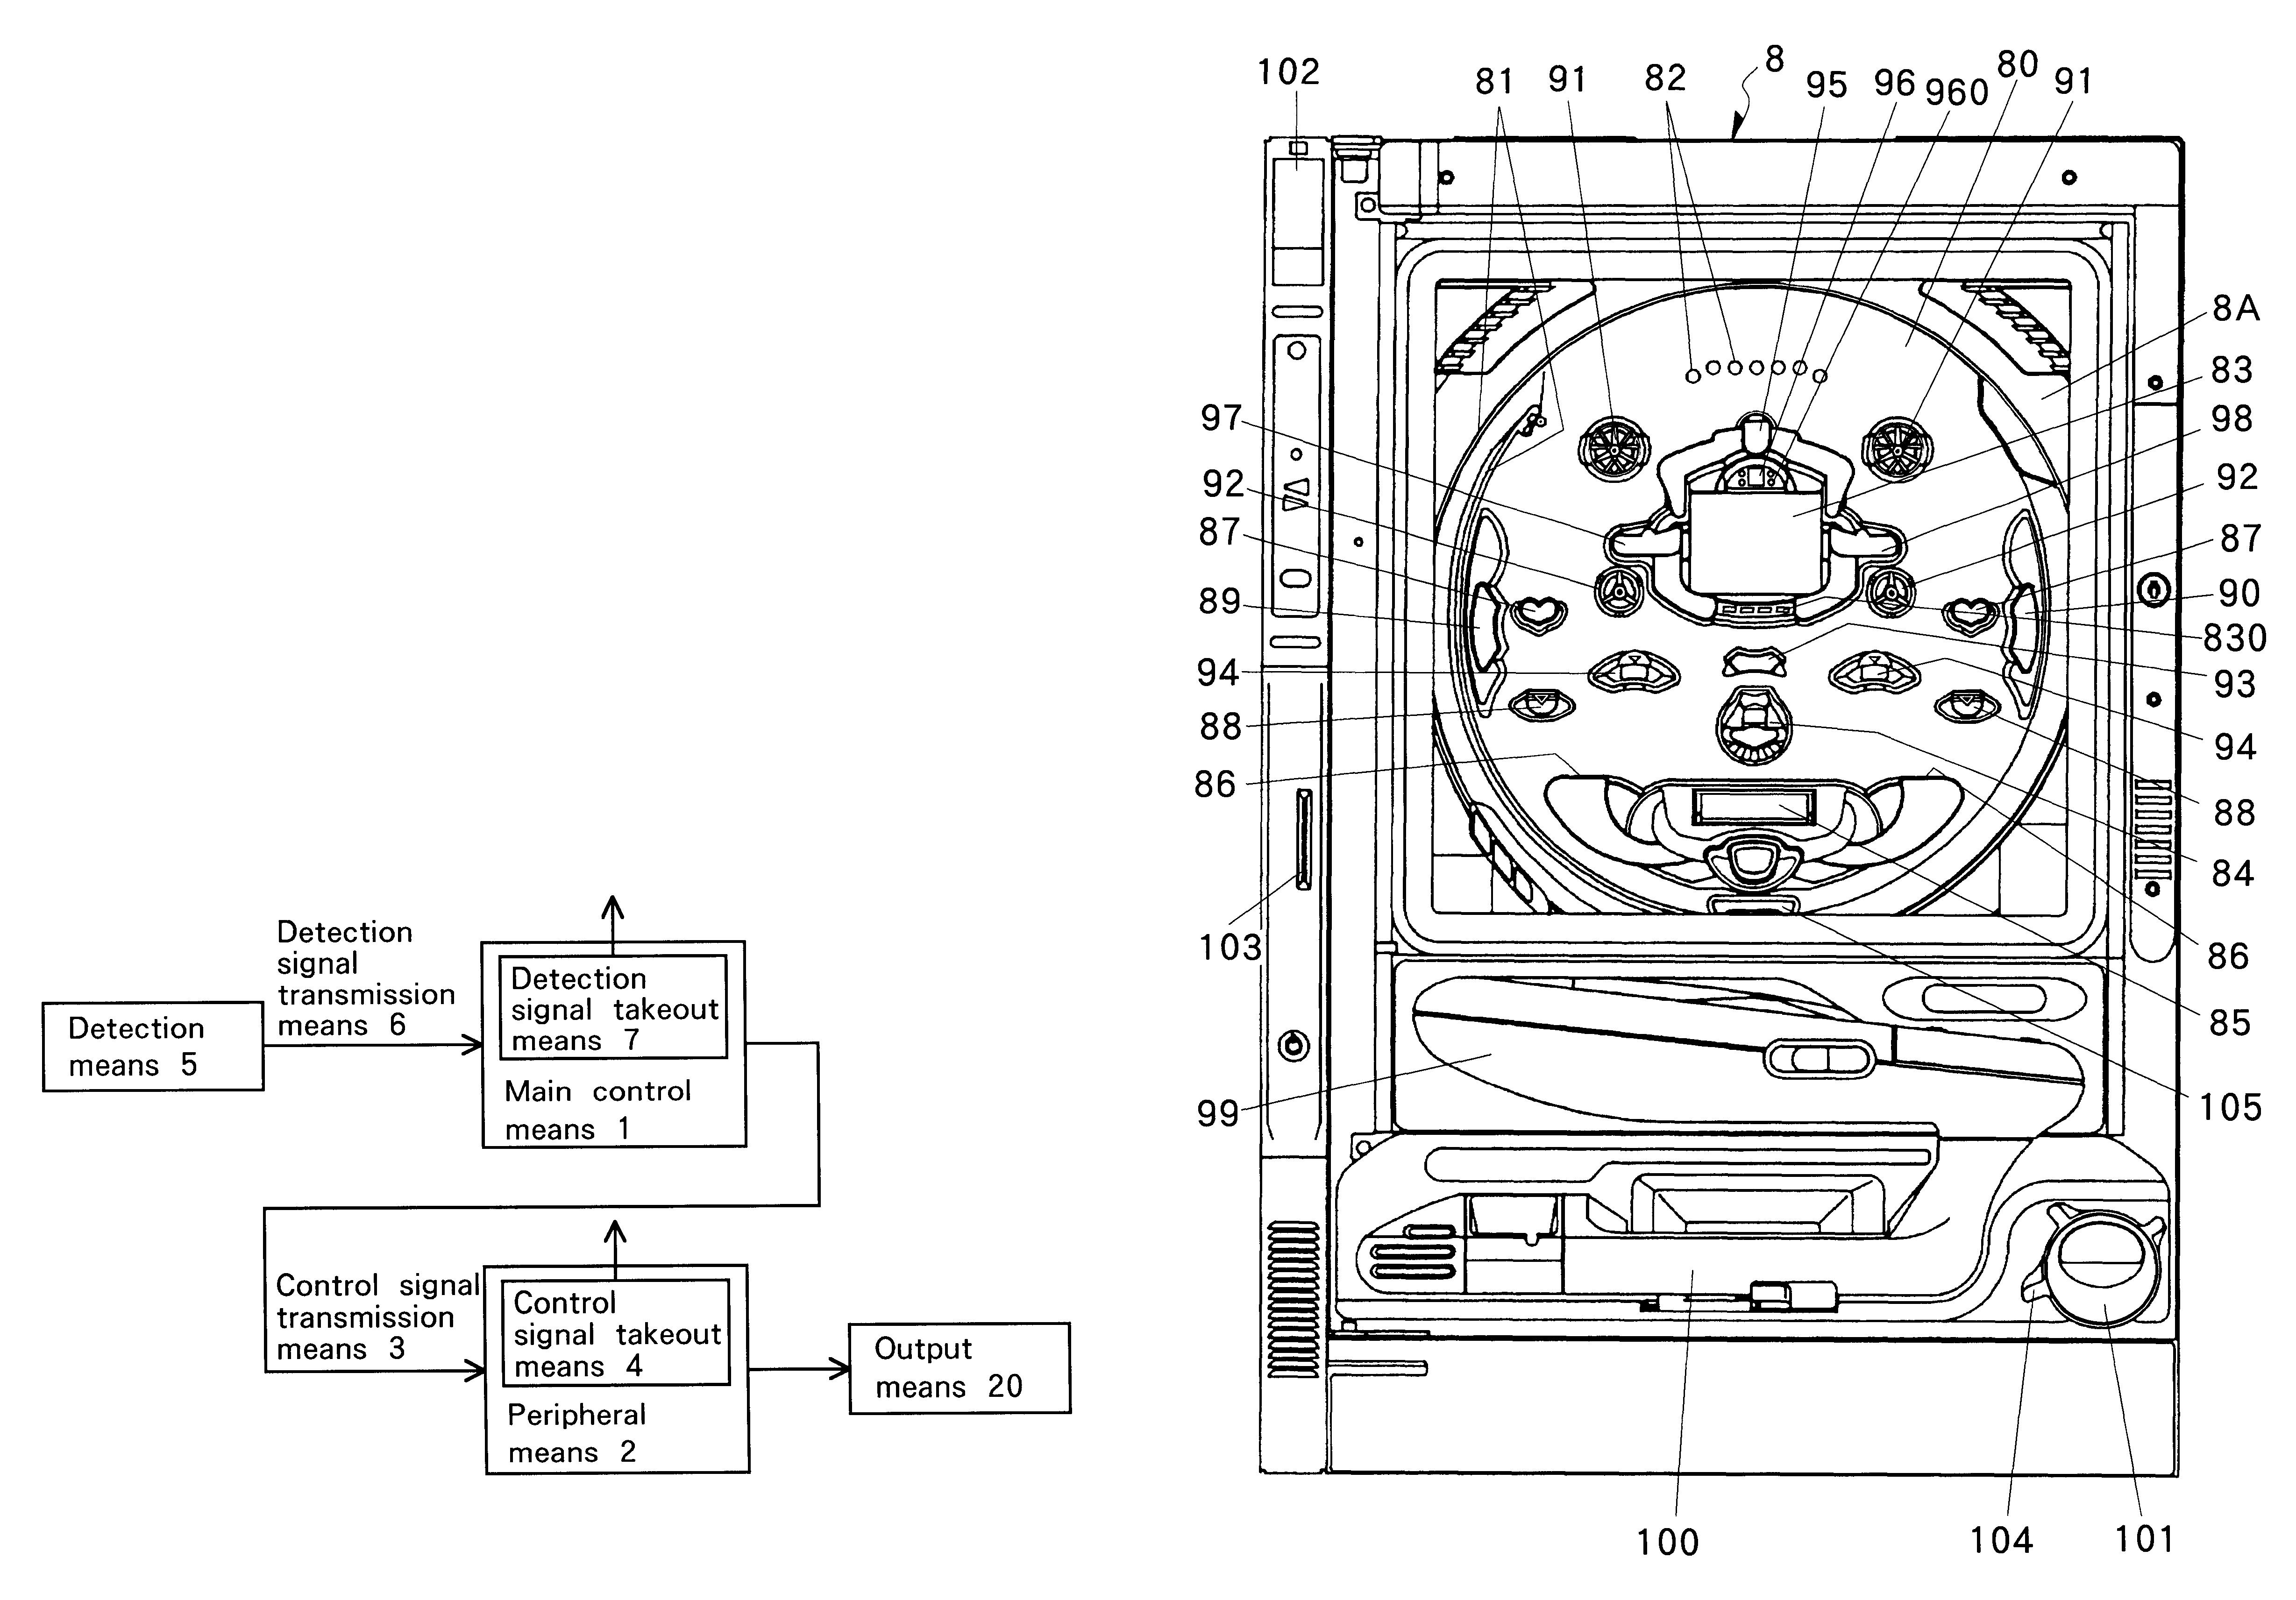 Unique Wiring Diagram For Jet Boat Diagram